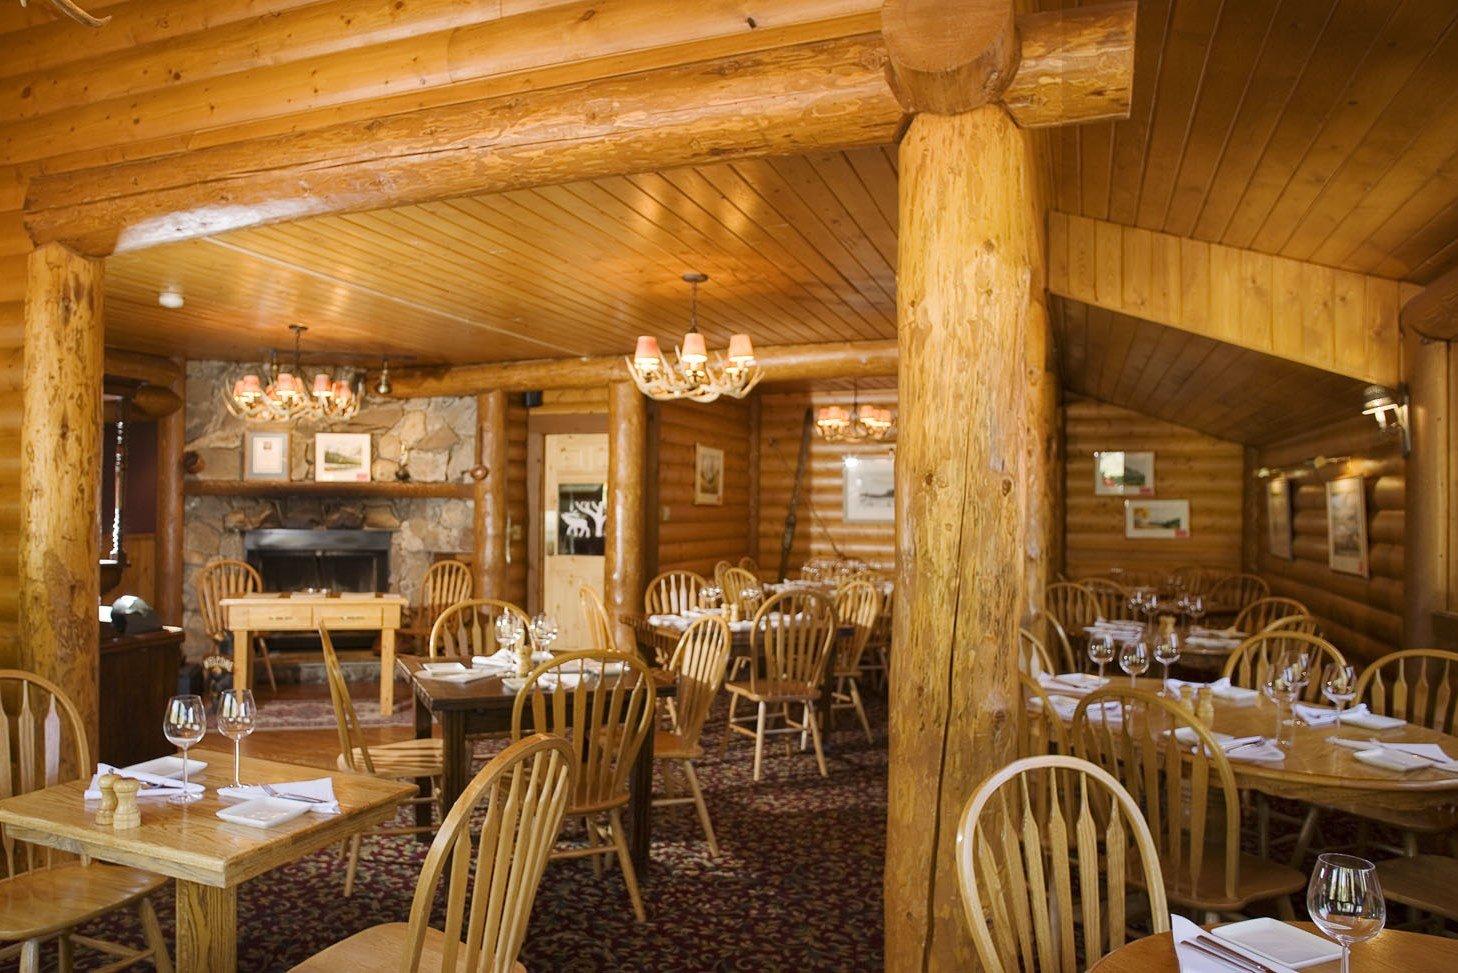 Lake Louise - Baker creek chalets dining room.jpeg